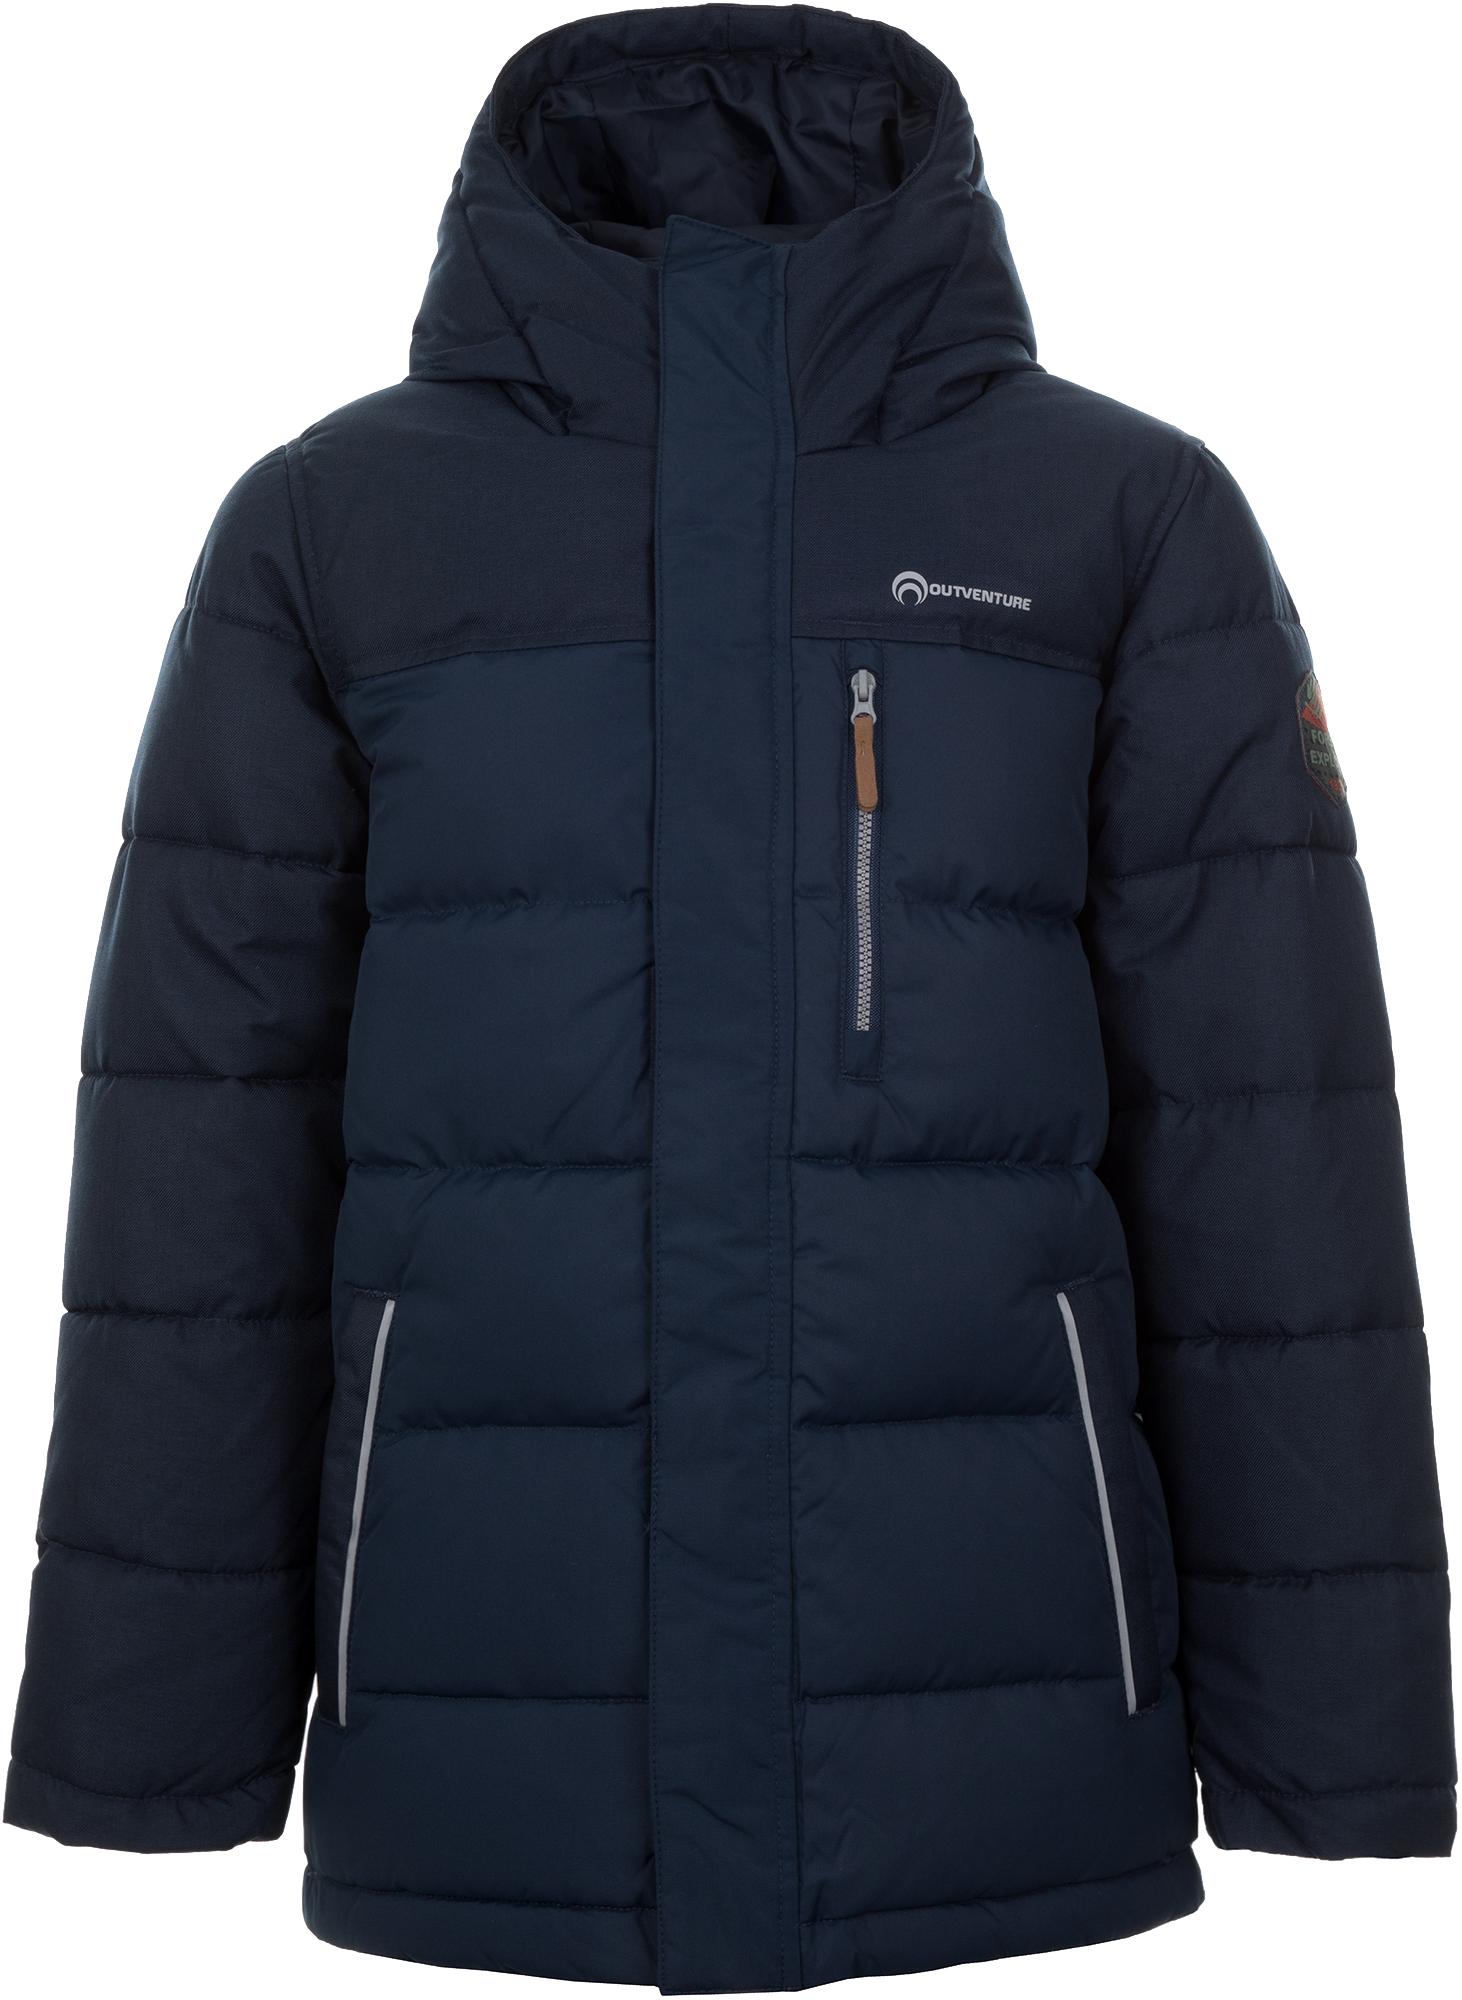 Outventure Куртка пуховая для мальчиков Outventure, размер 164